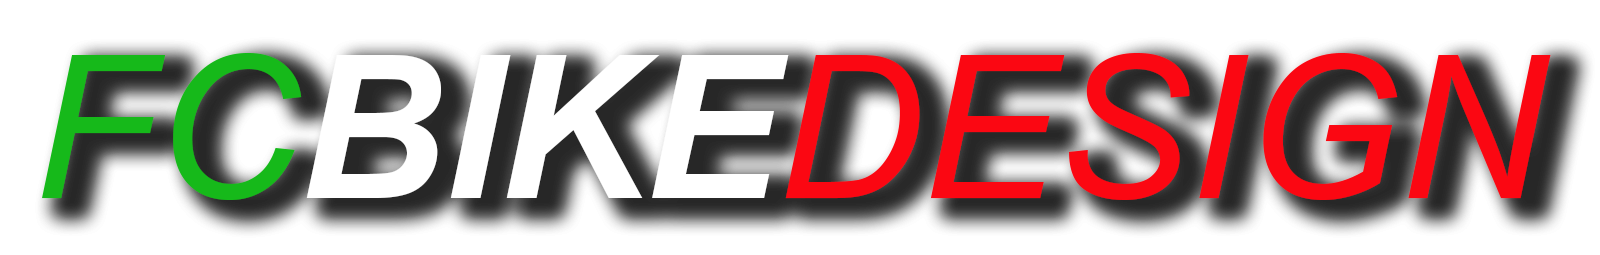 fcbikedesign_logo_1